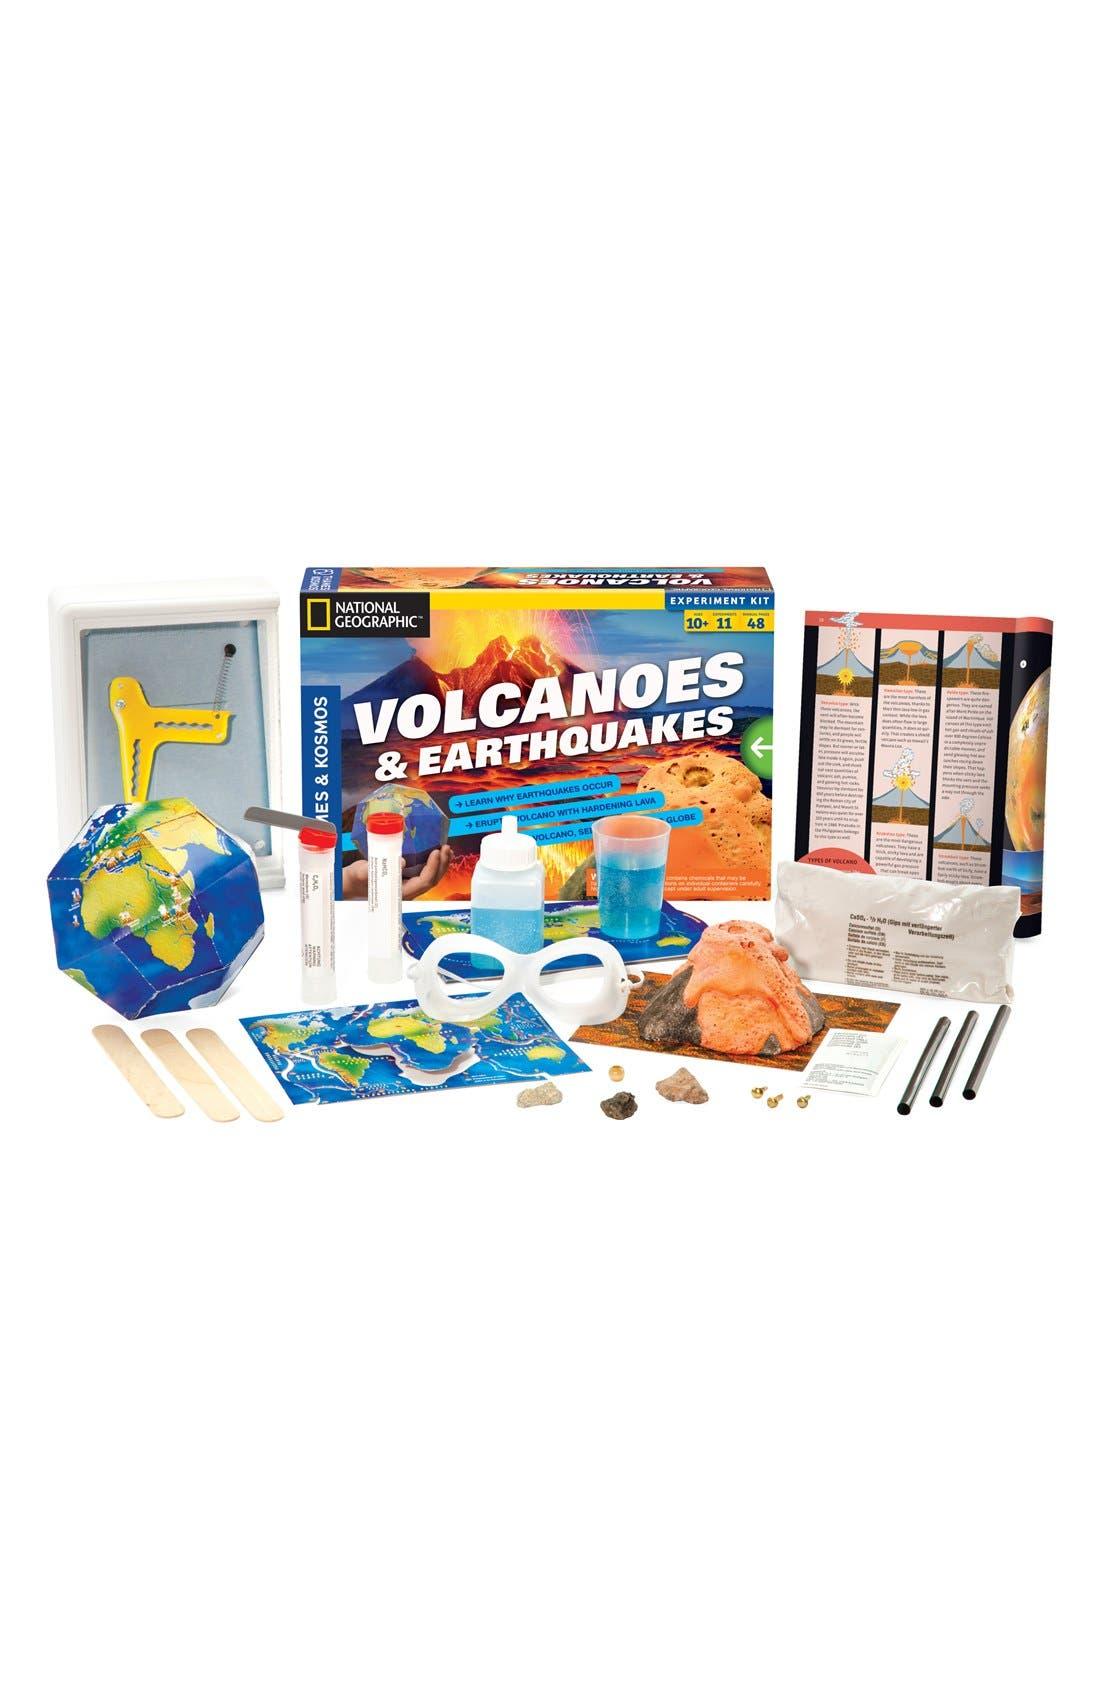 'Volcanoes & Earthquakes' Experiment Kit,                             Main thumbnail 1, color,                             None